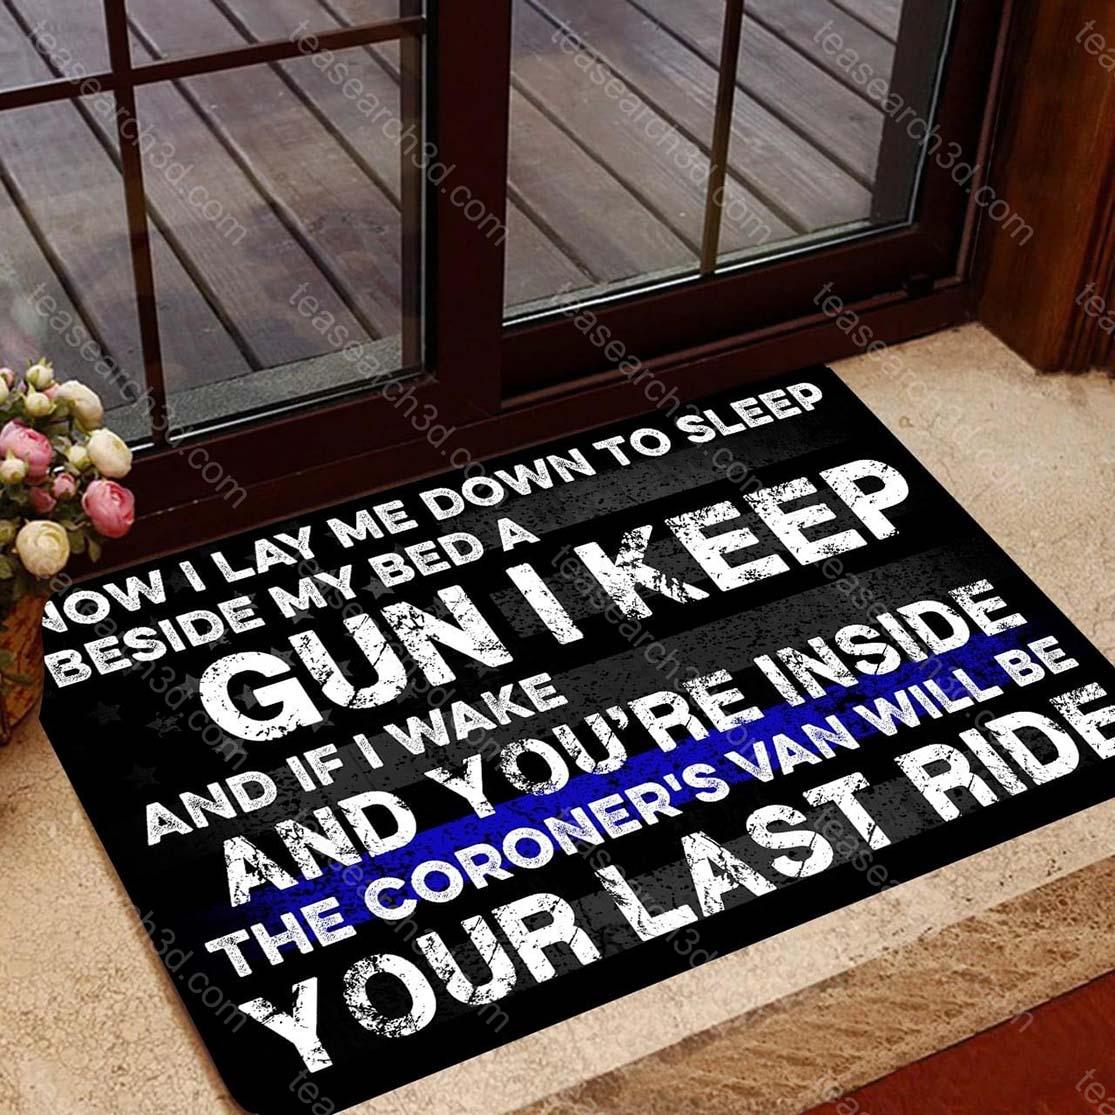 Now I lay me down to sleep doormat